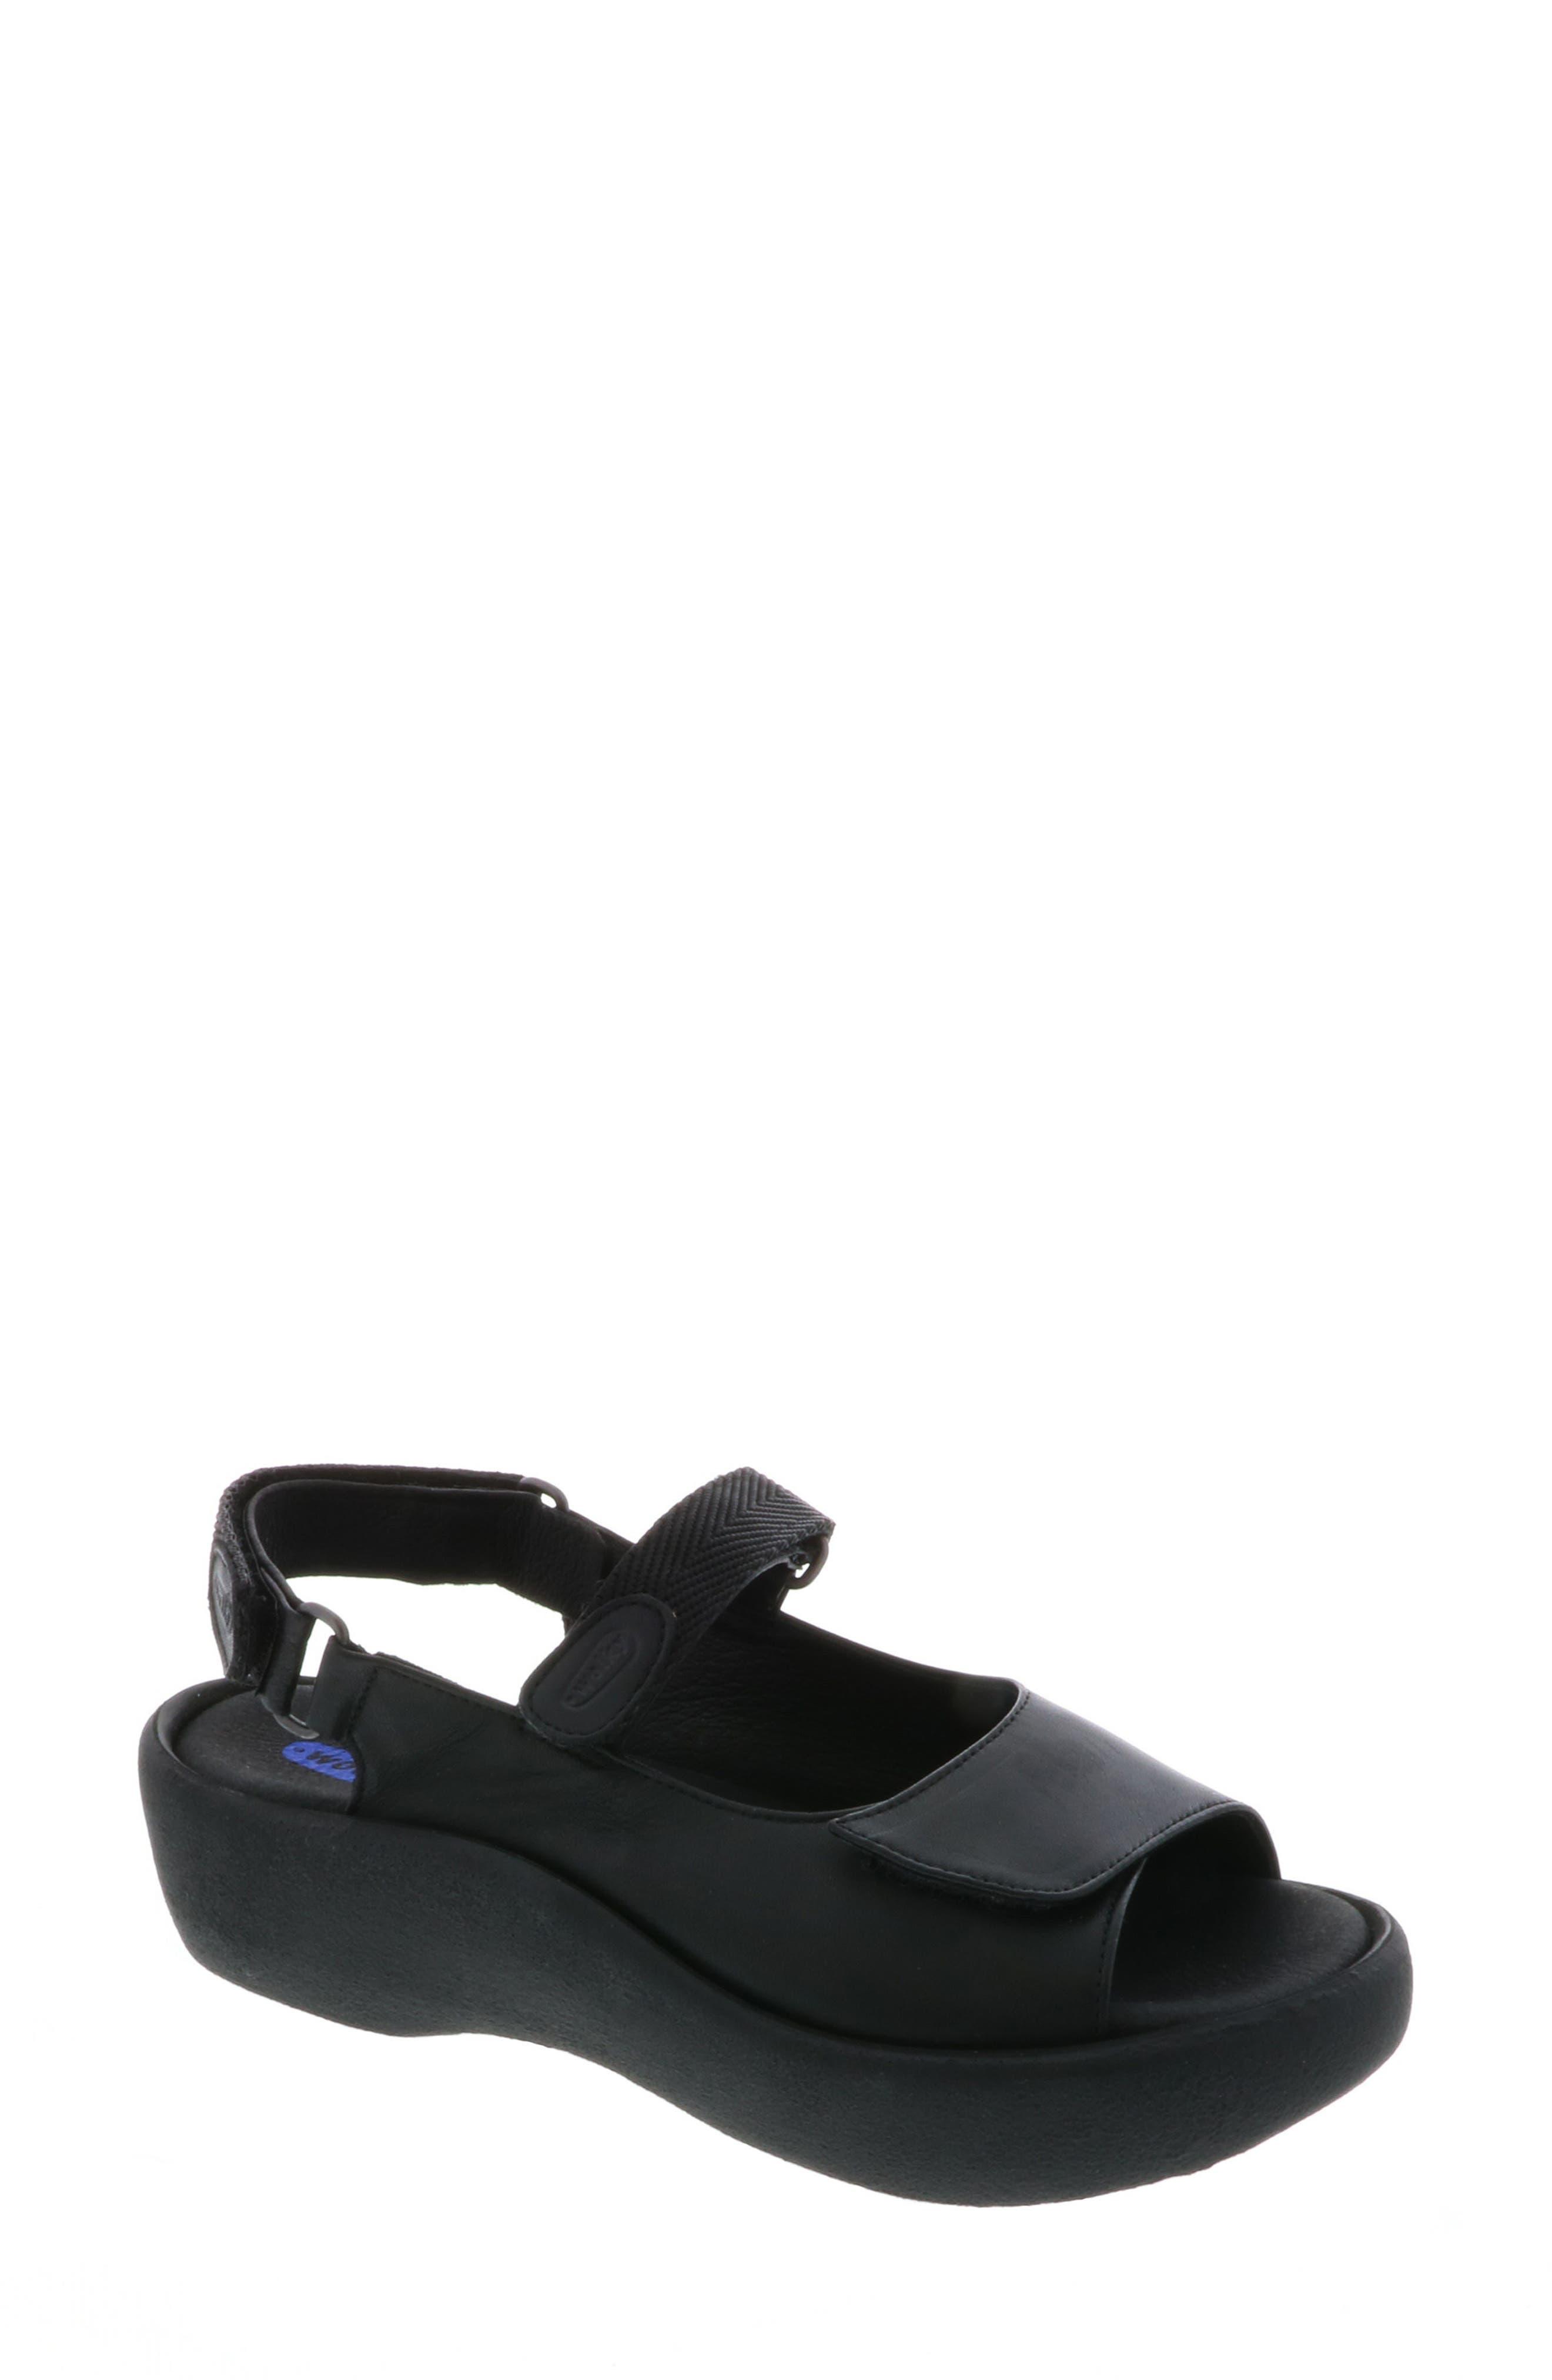 WOLKY Jewel Sport Sandal, Main, color, BLACK/ BLACK